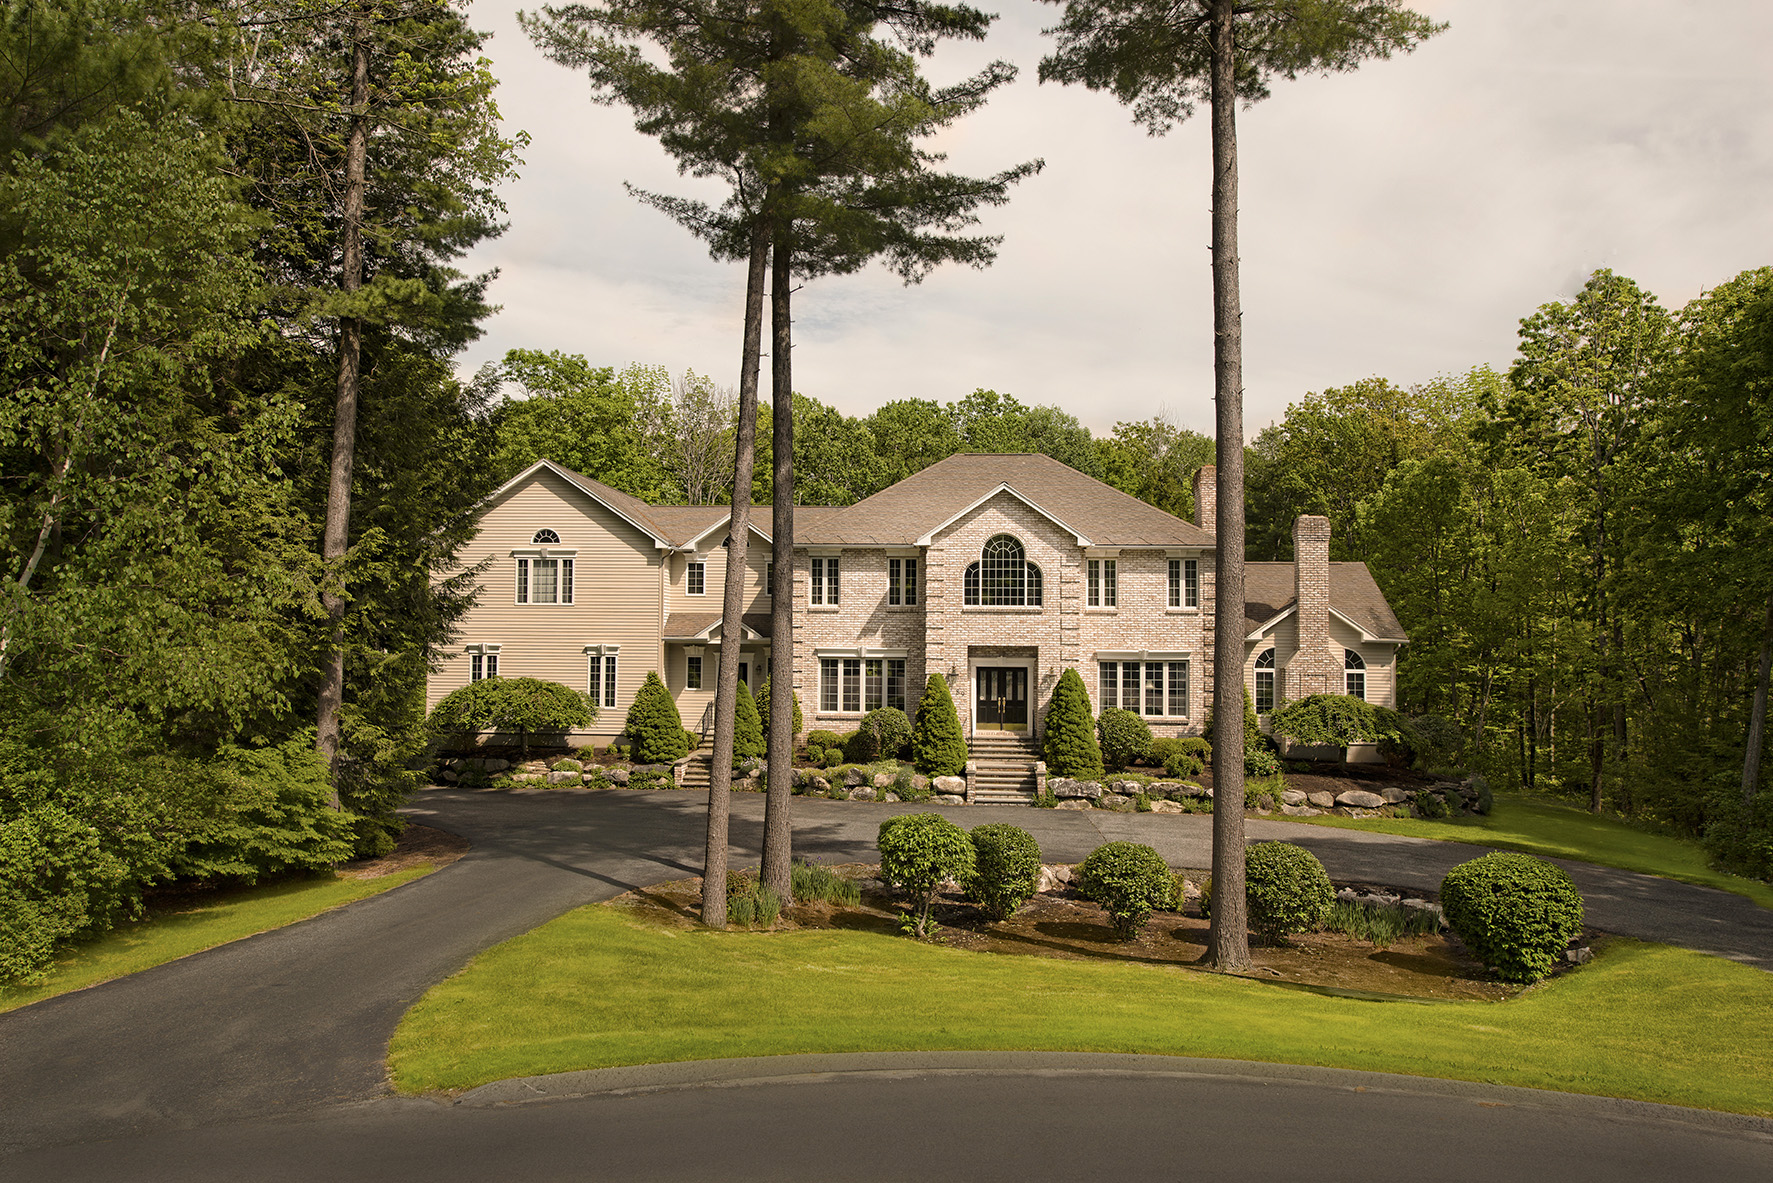 獨棟家庭住宅 為 出售 在 Outstanding Custom Built Lenox Home 89 Dunmore Ct Lenox, 麻塞諸塞州, 01240 美國